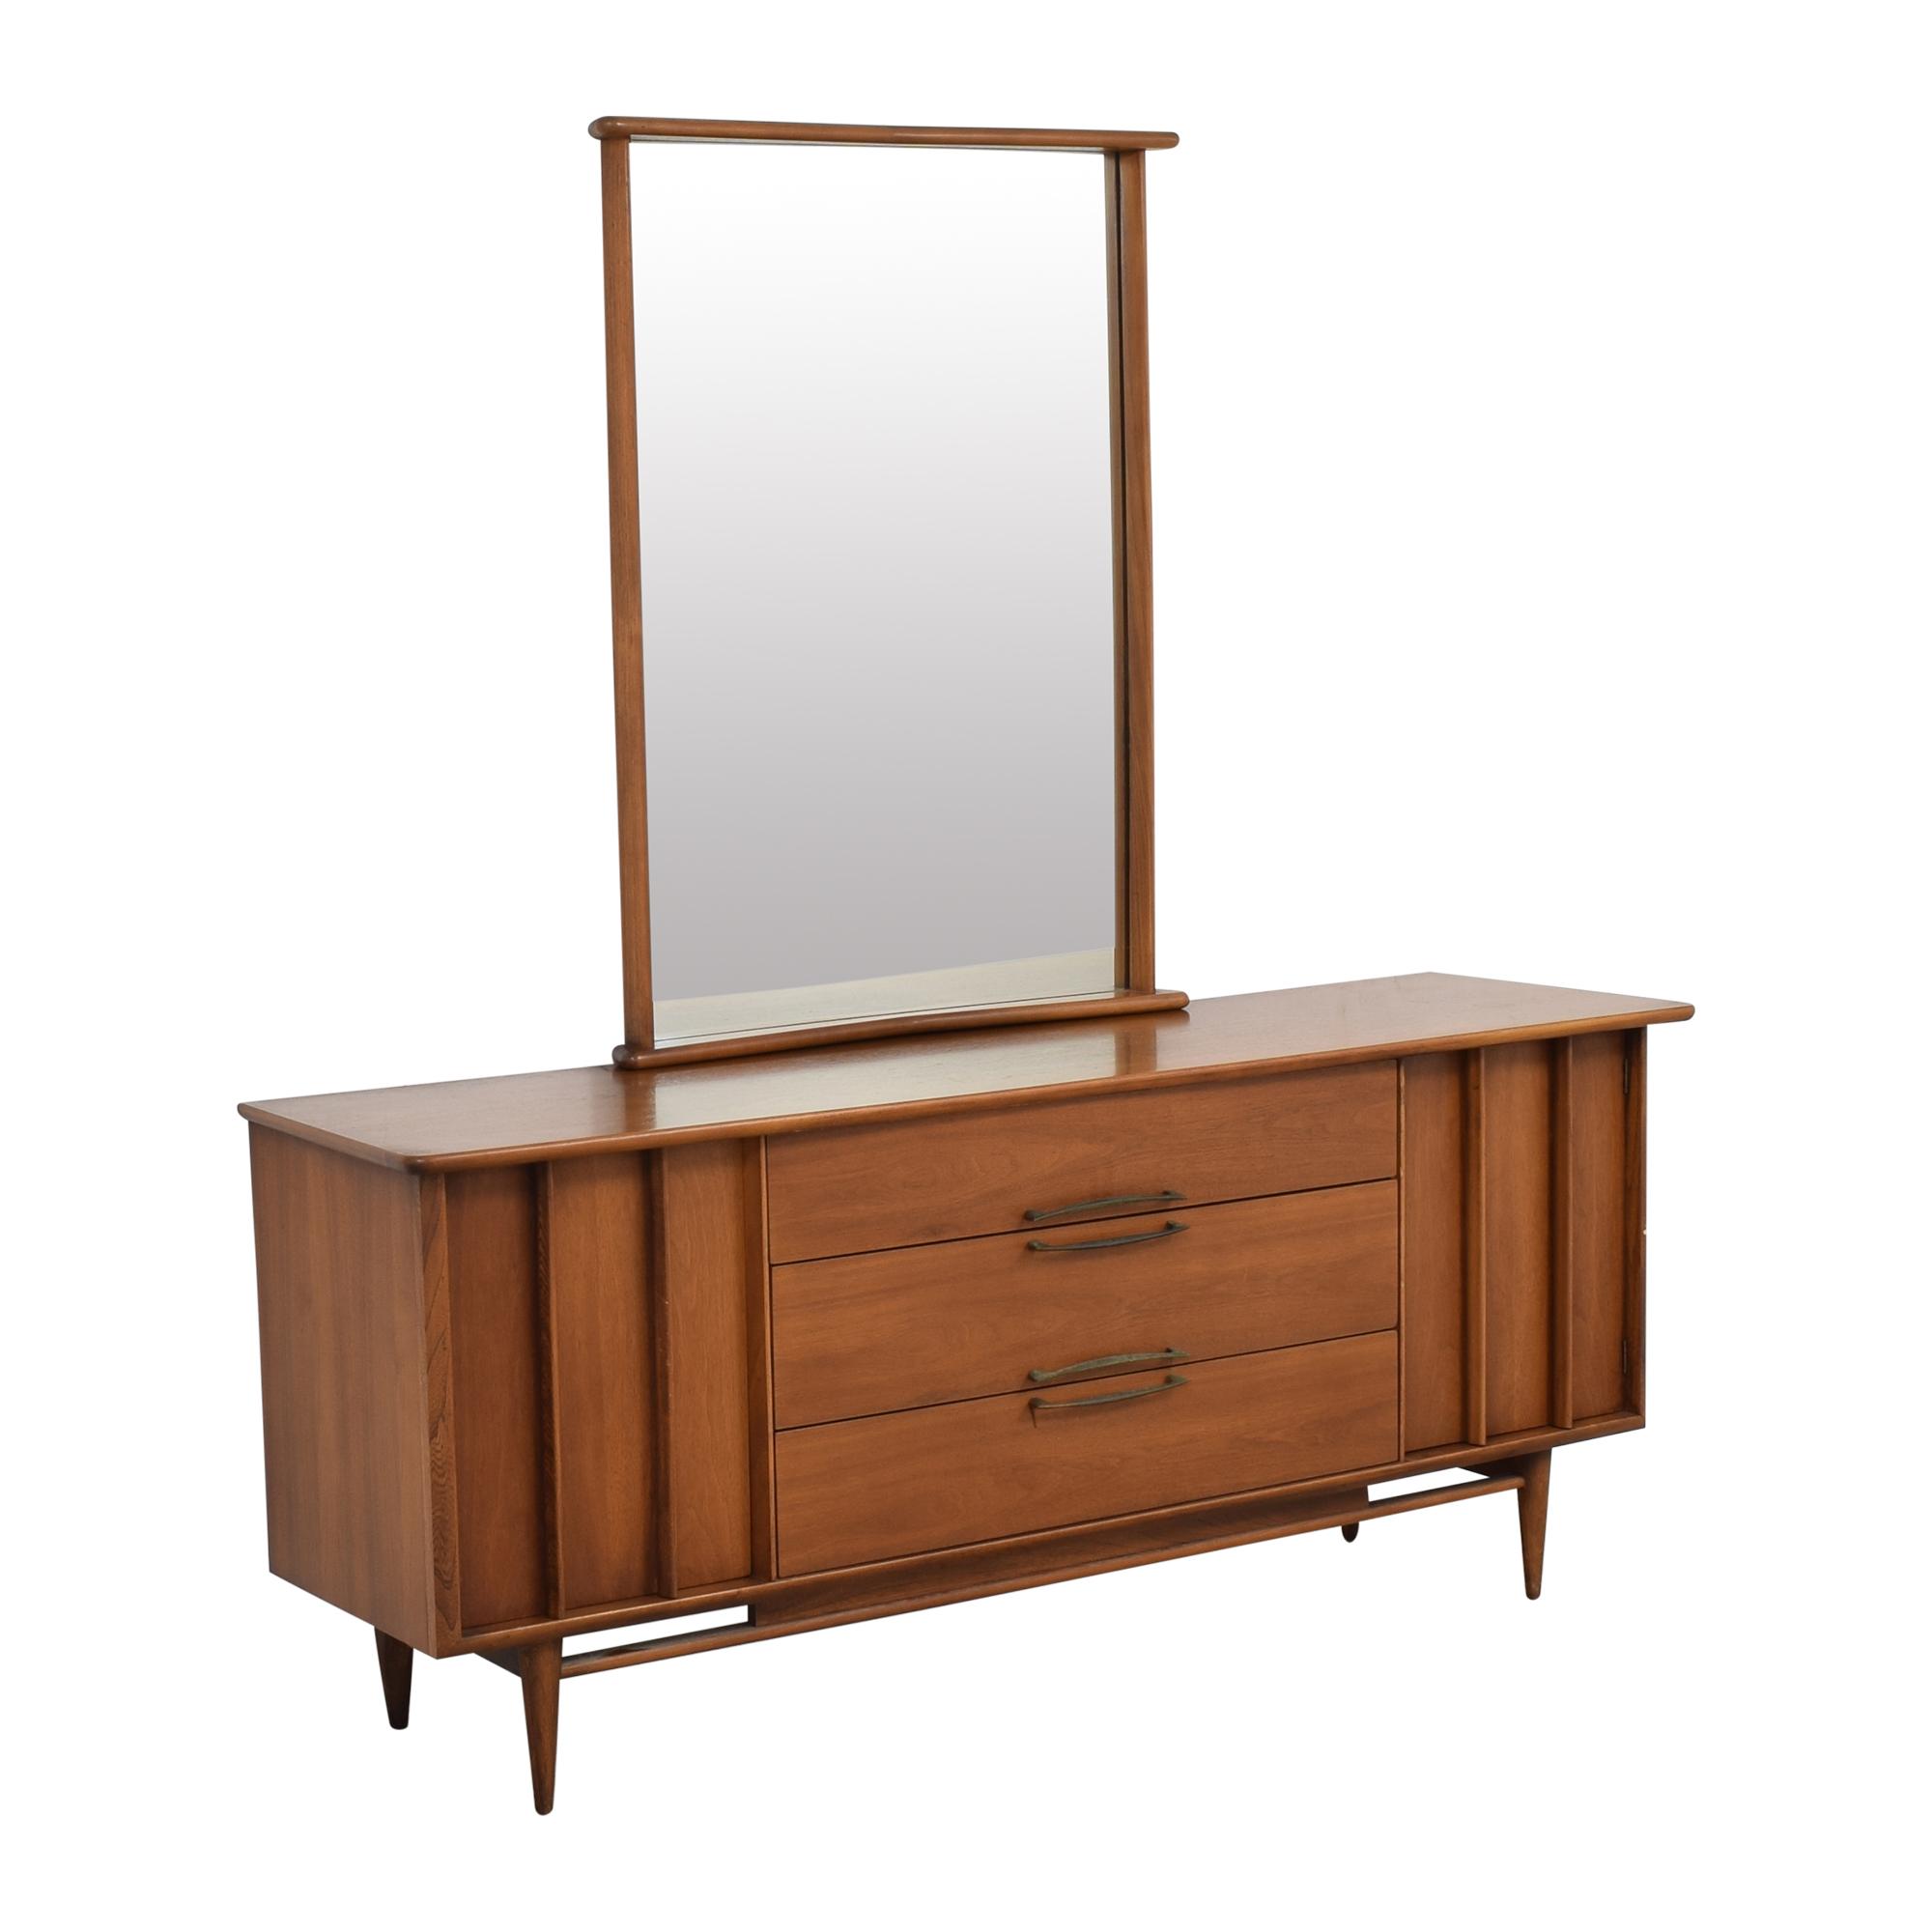 Kent Coffey Kent Coffey The Eloquence Dresser with Mirror second hand